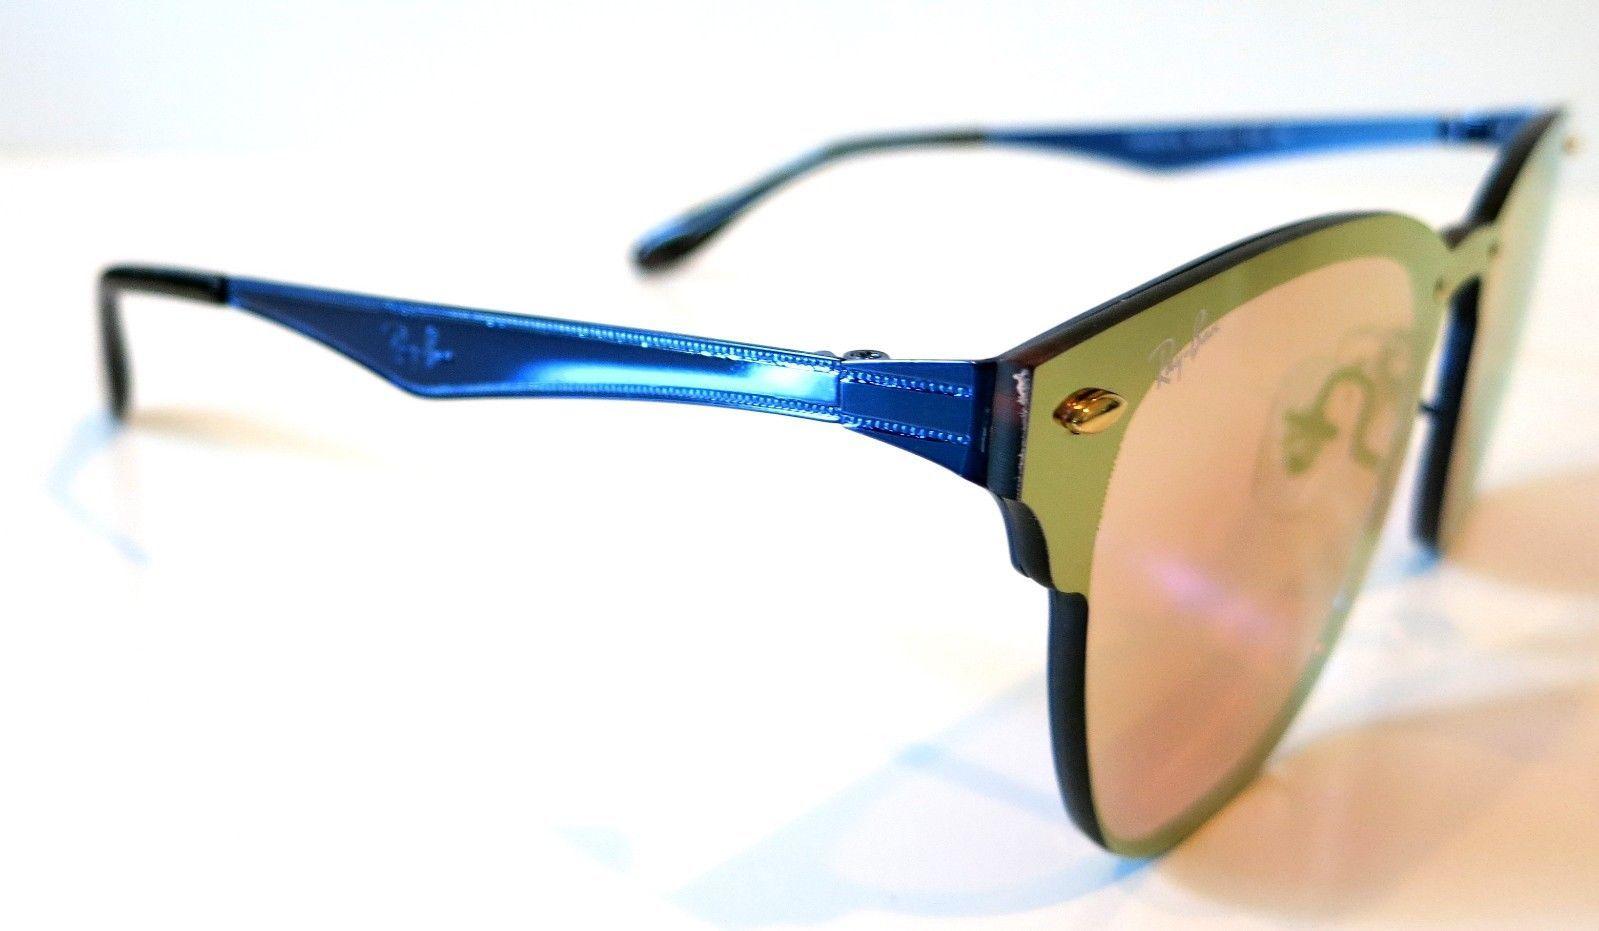 e72087c174 Rayban Blaze Clubmaster sunglasses RB3576N 9037 7J Blue Orange Yellow 3576  Club